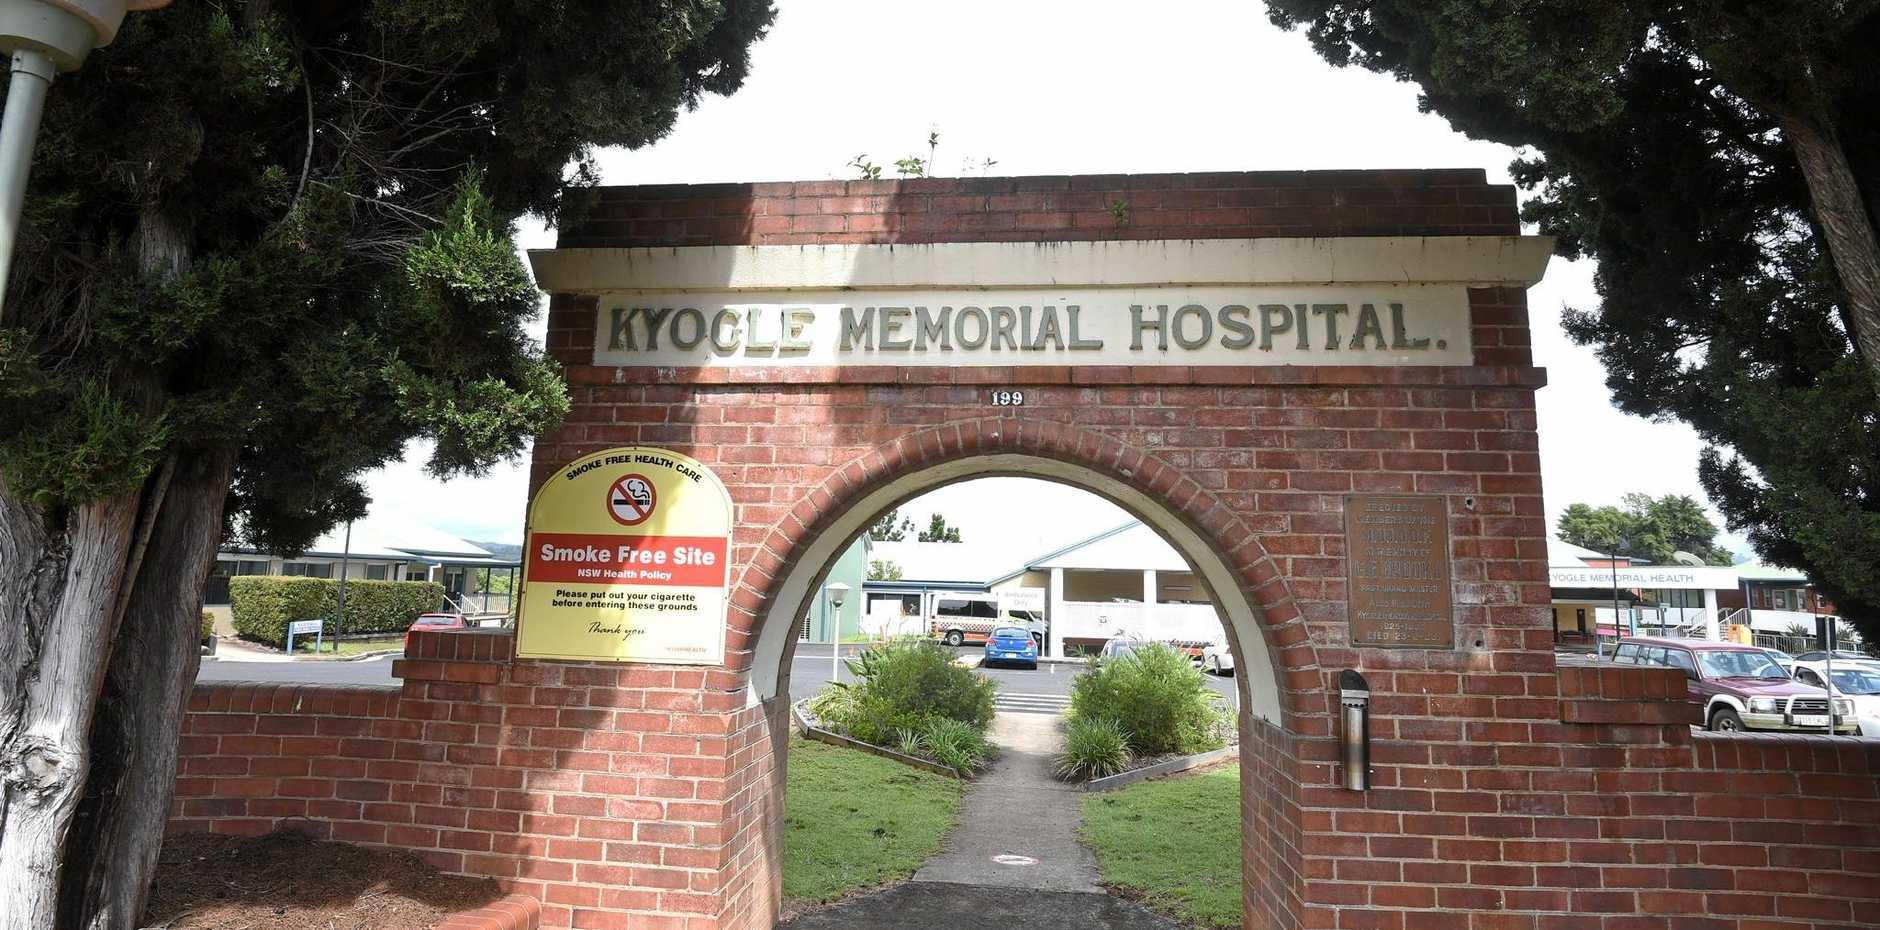 Kyogle Memorial Hospital file photo.